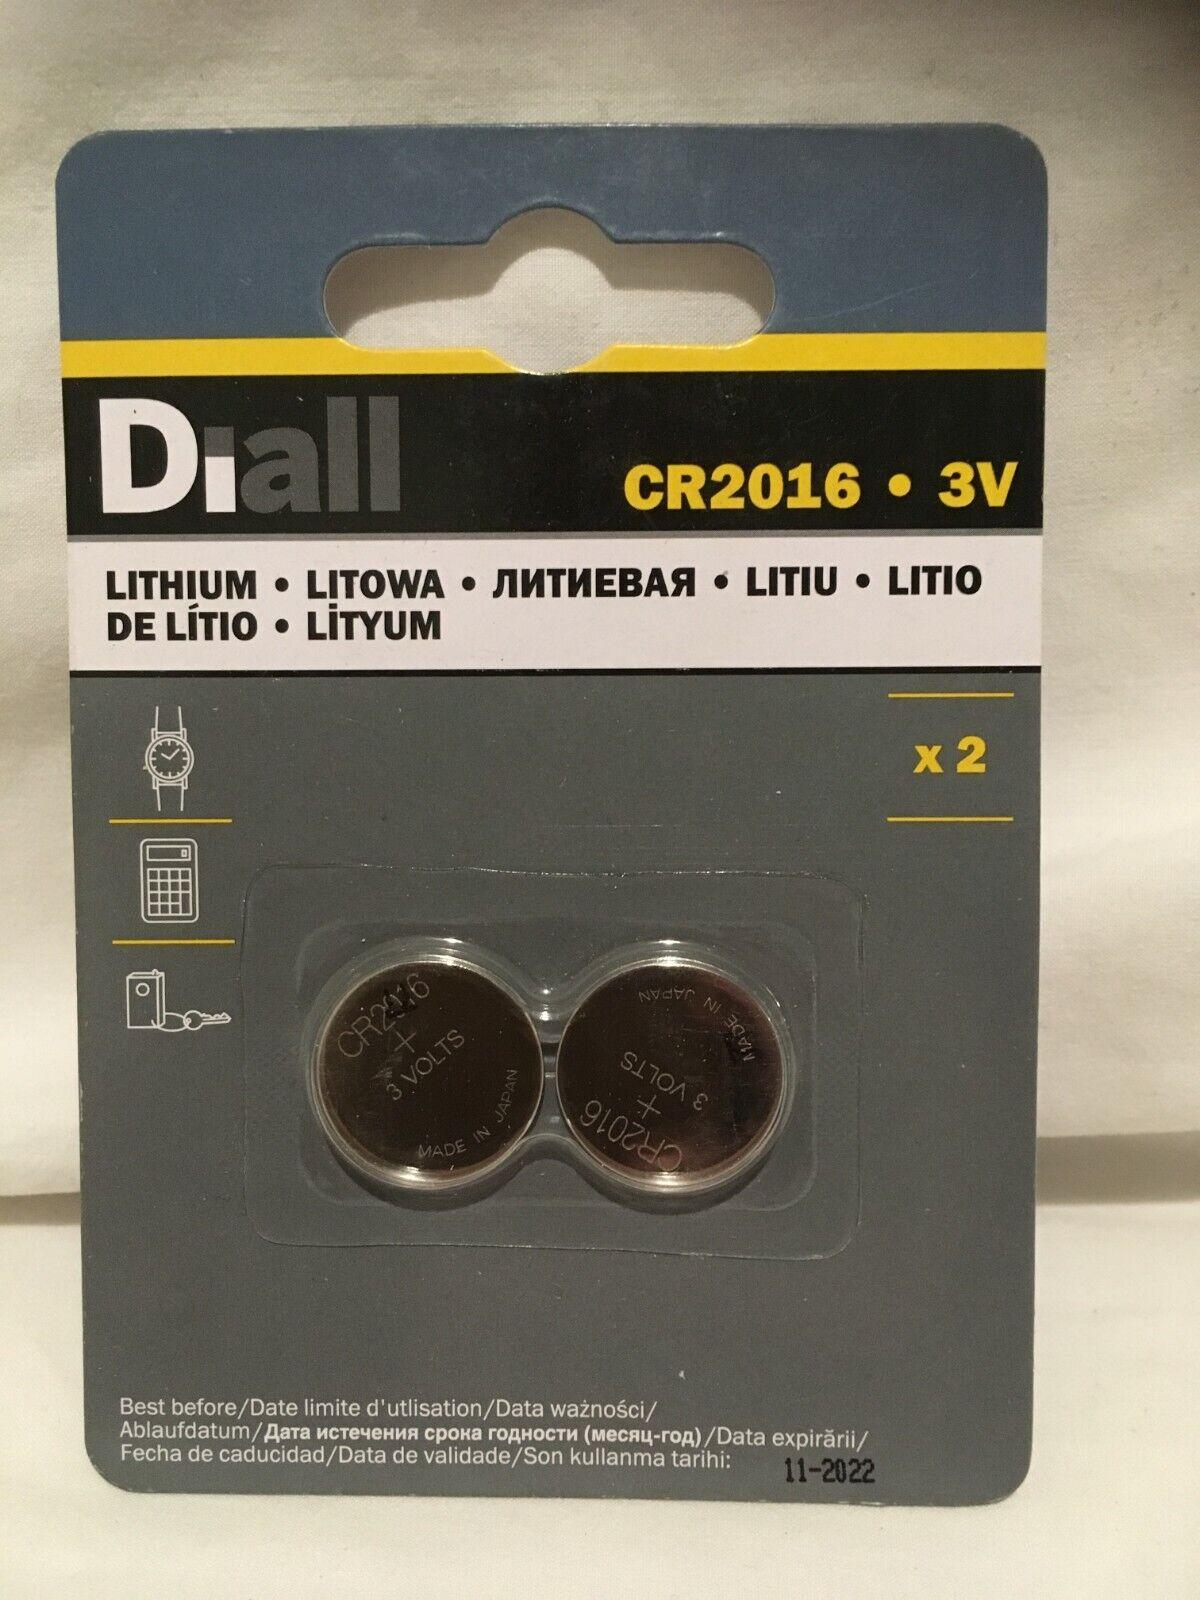 CR2016 lithium battery